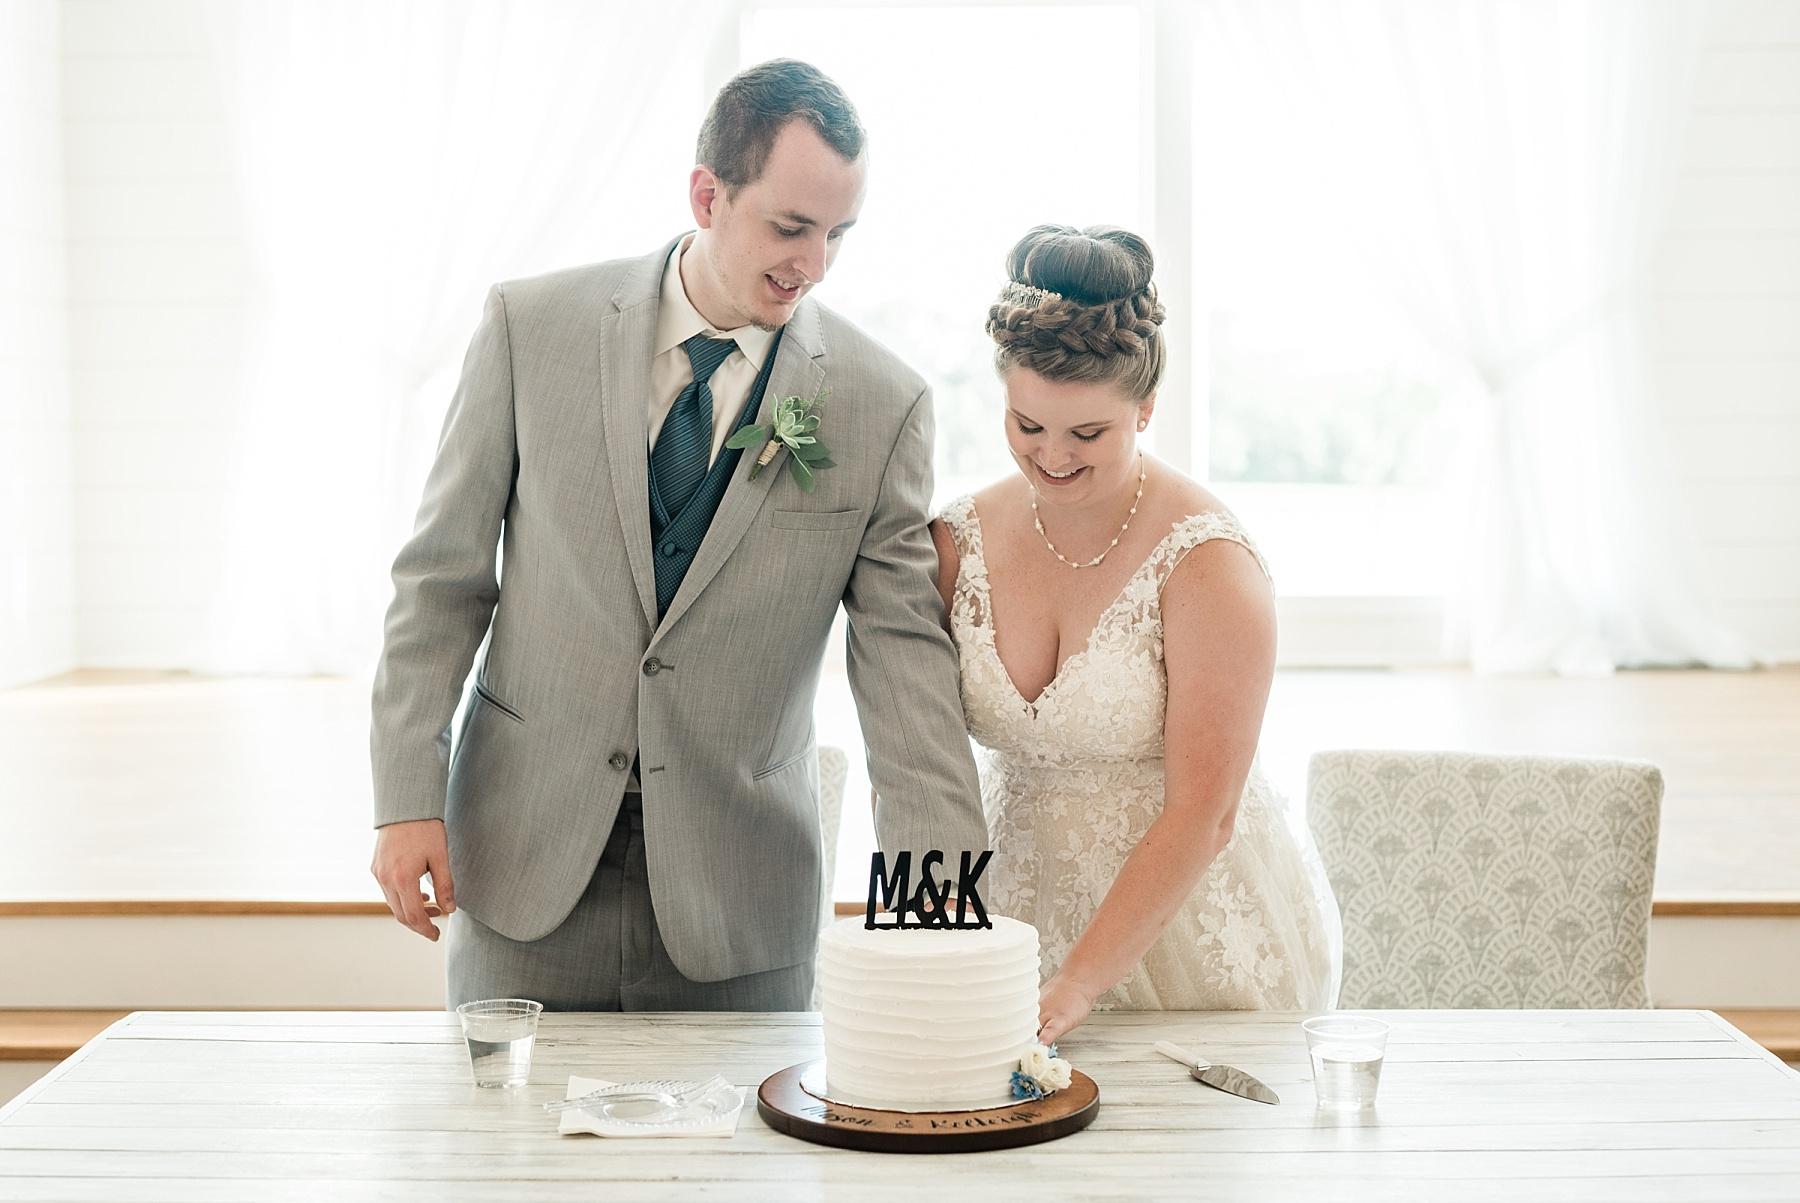 Intimate Summer Wedding at Emerson Fields by Kelsi Kliethermes Photography Best Missouri and Maui Wedding Photographer_0006.jpg